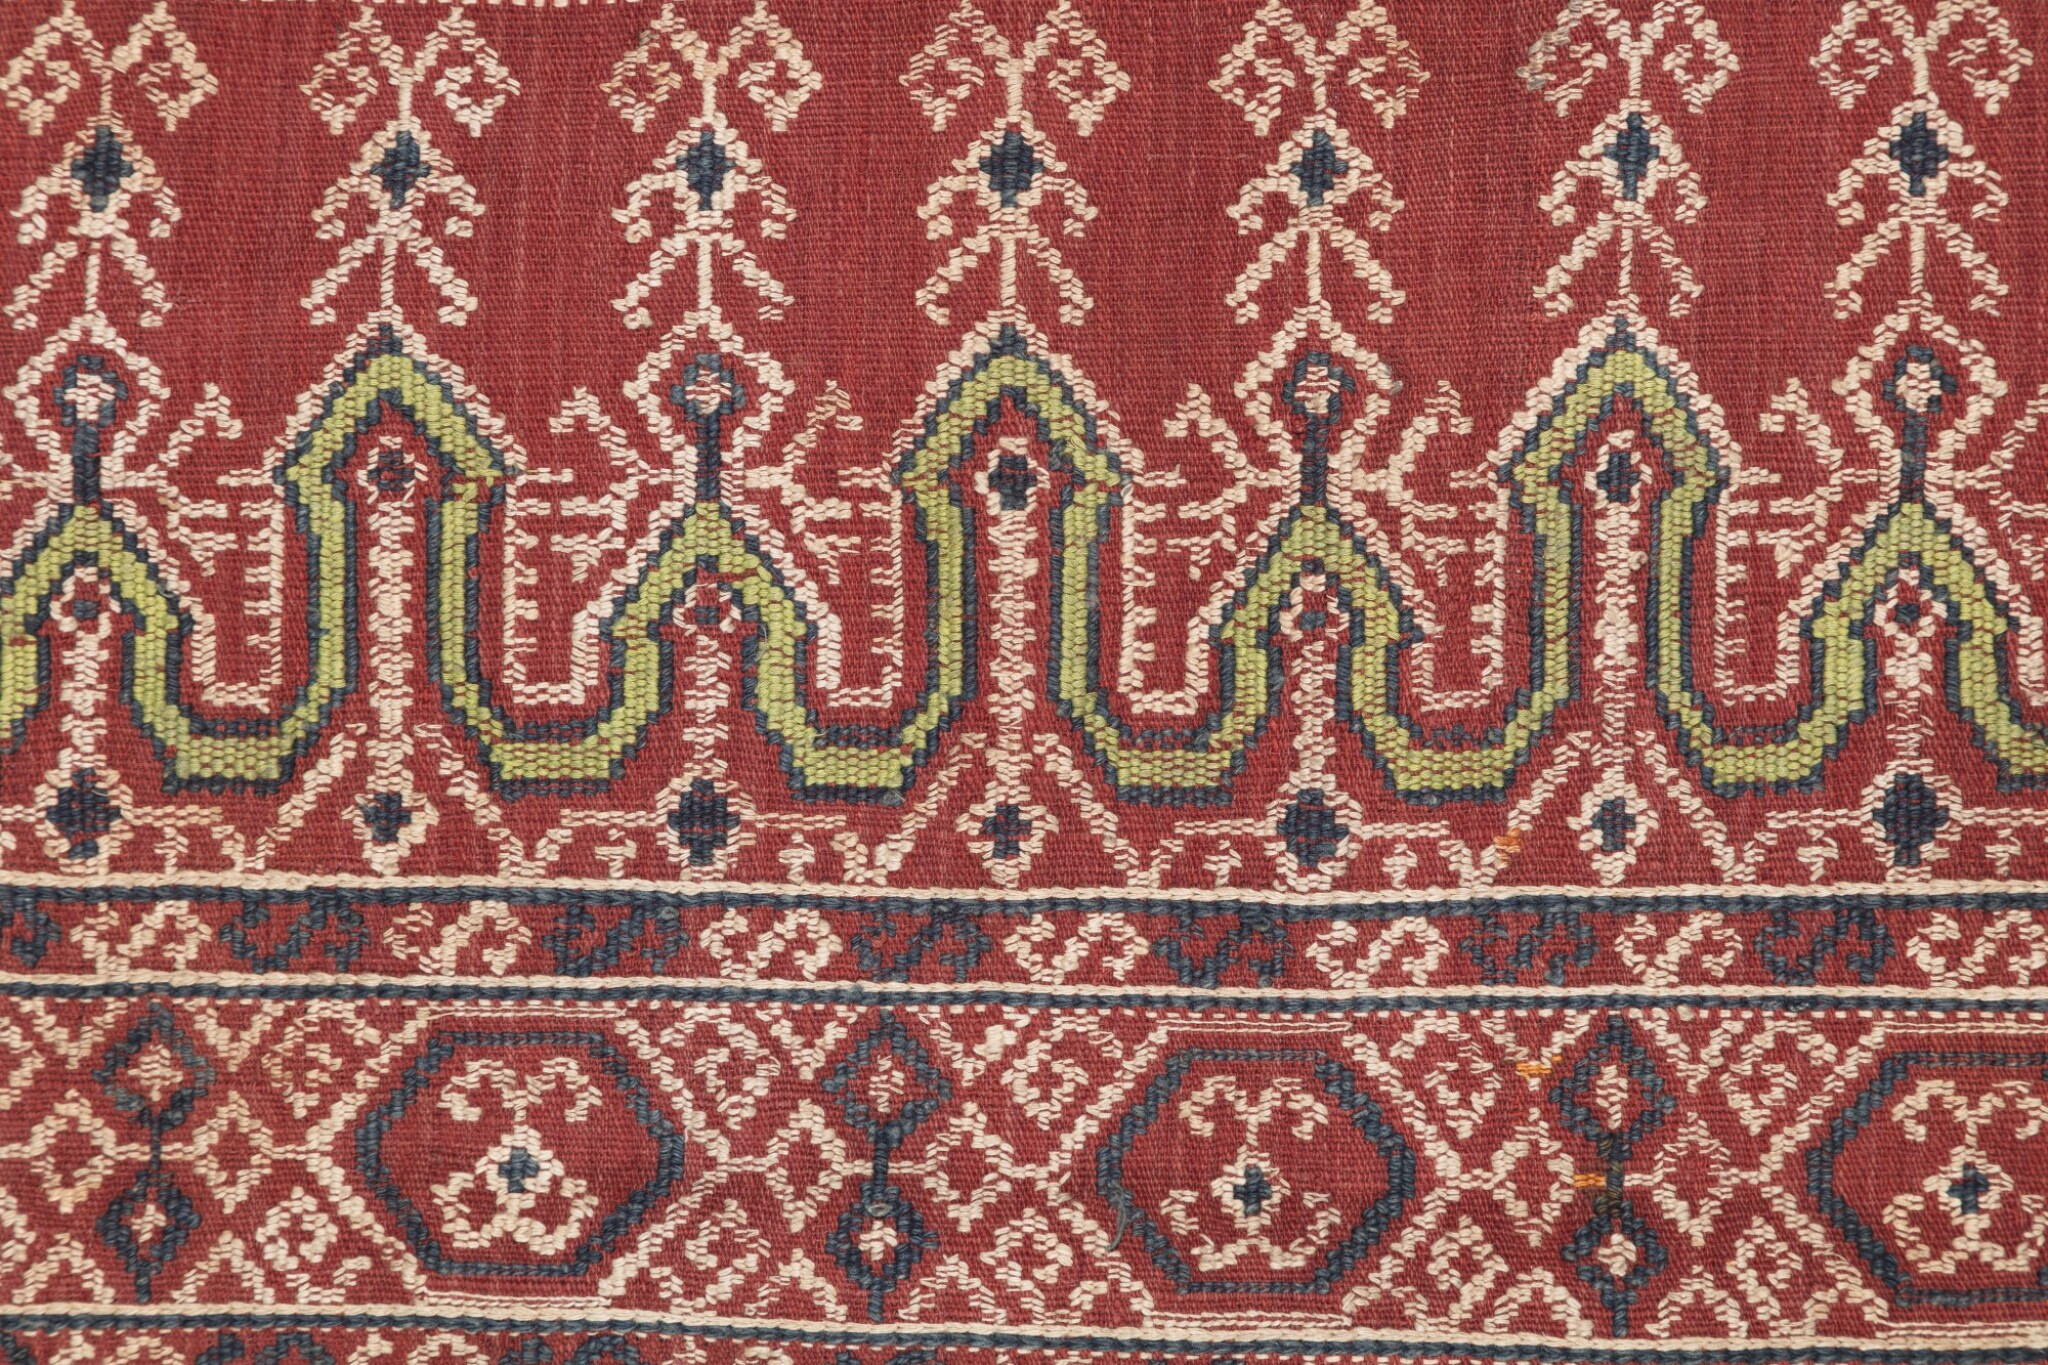 View full screen - View 1 of Lot 50. Tissu cérémoniel pua, Iban, Borneo, Indonesia, début du 20e siècle | Sacred ceremonial cloth pua, Iban, Borneo, Indonesia, early 20th century.